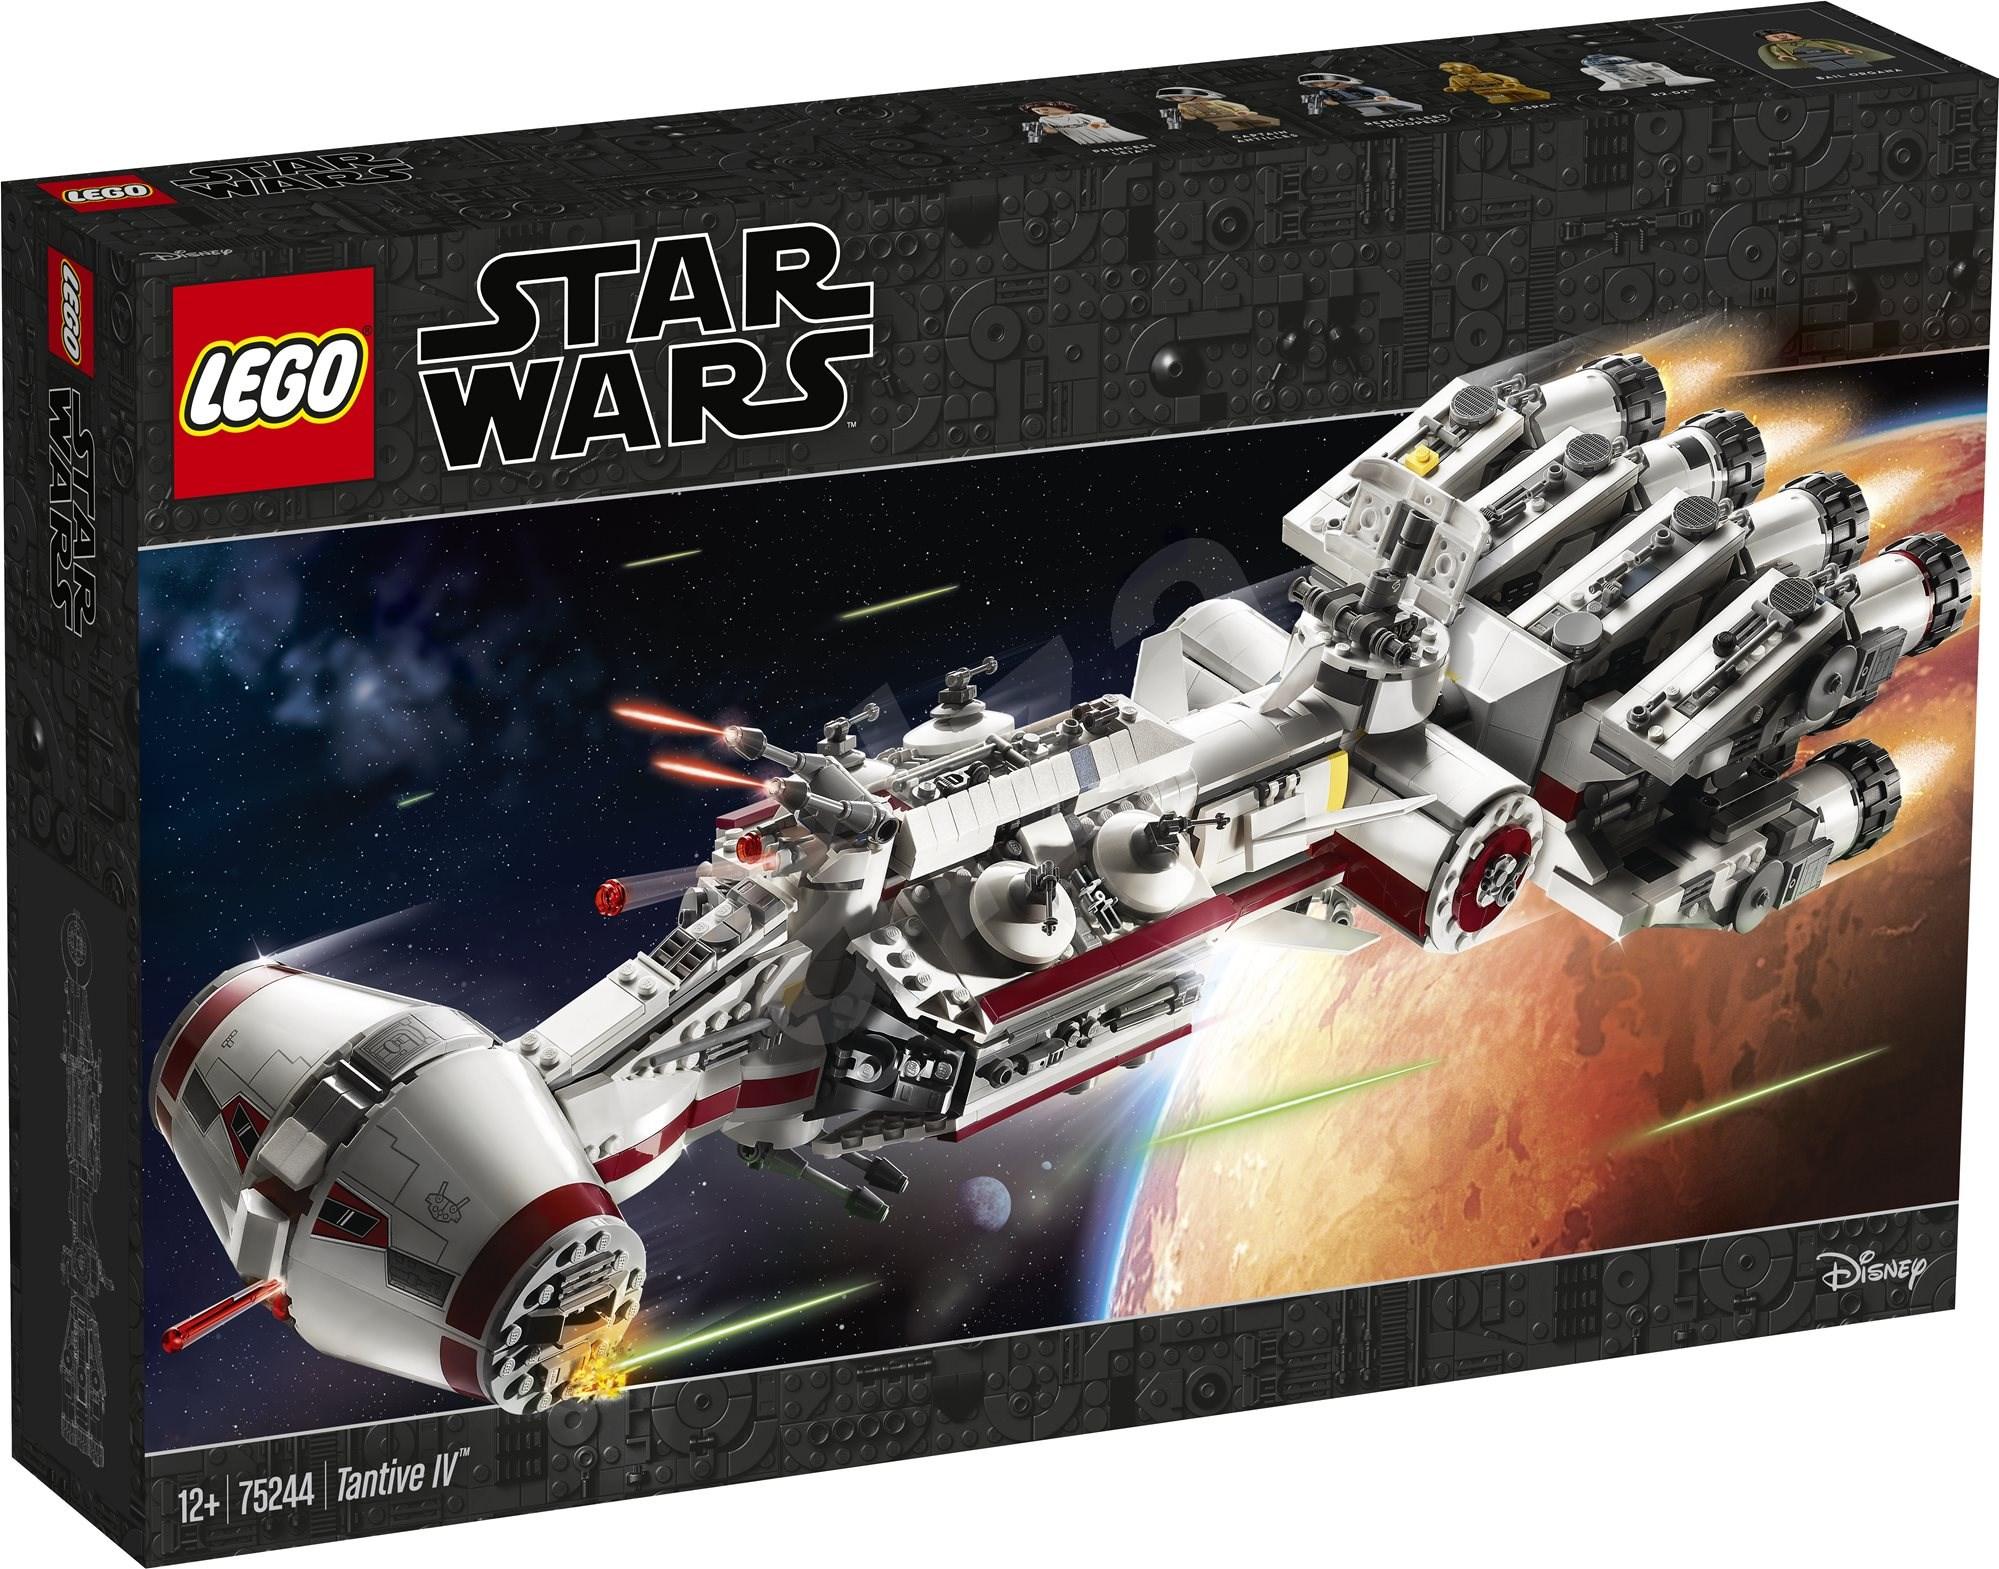 Jouet Lego Star Wars 75244 - Tantive IV